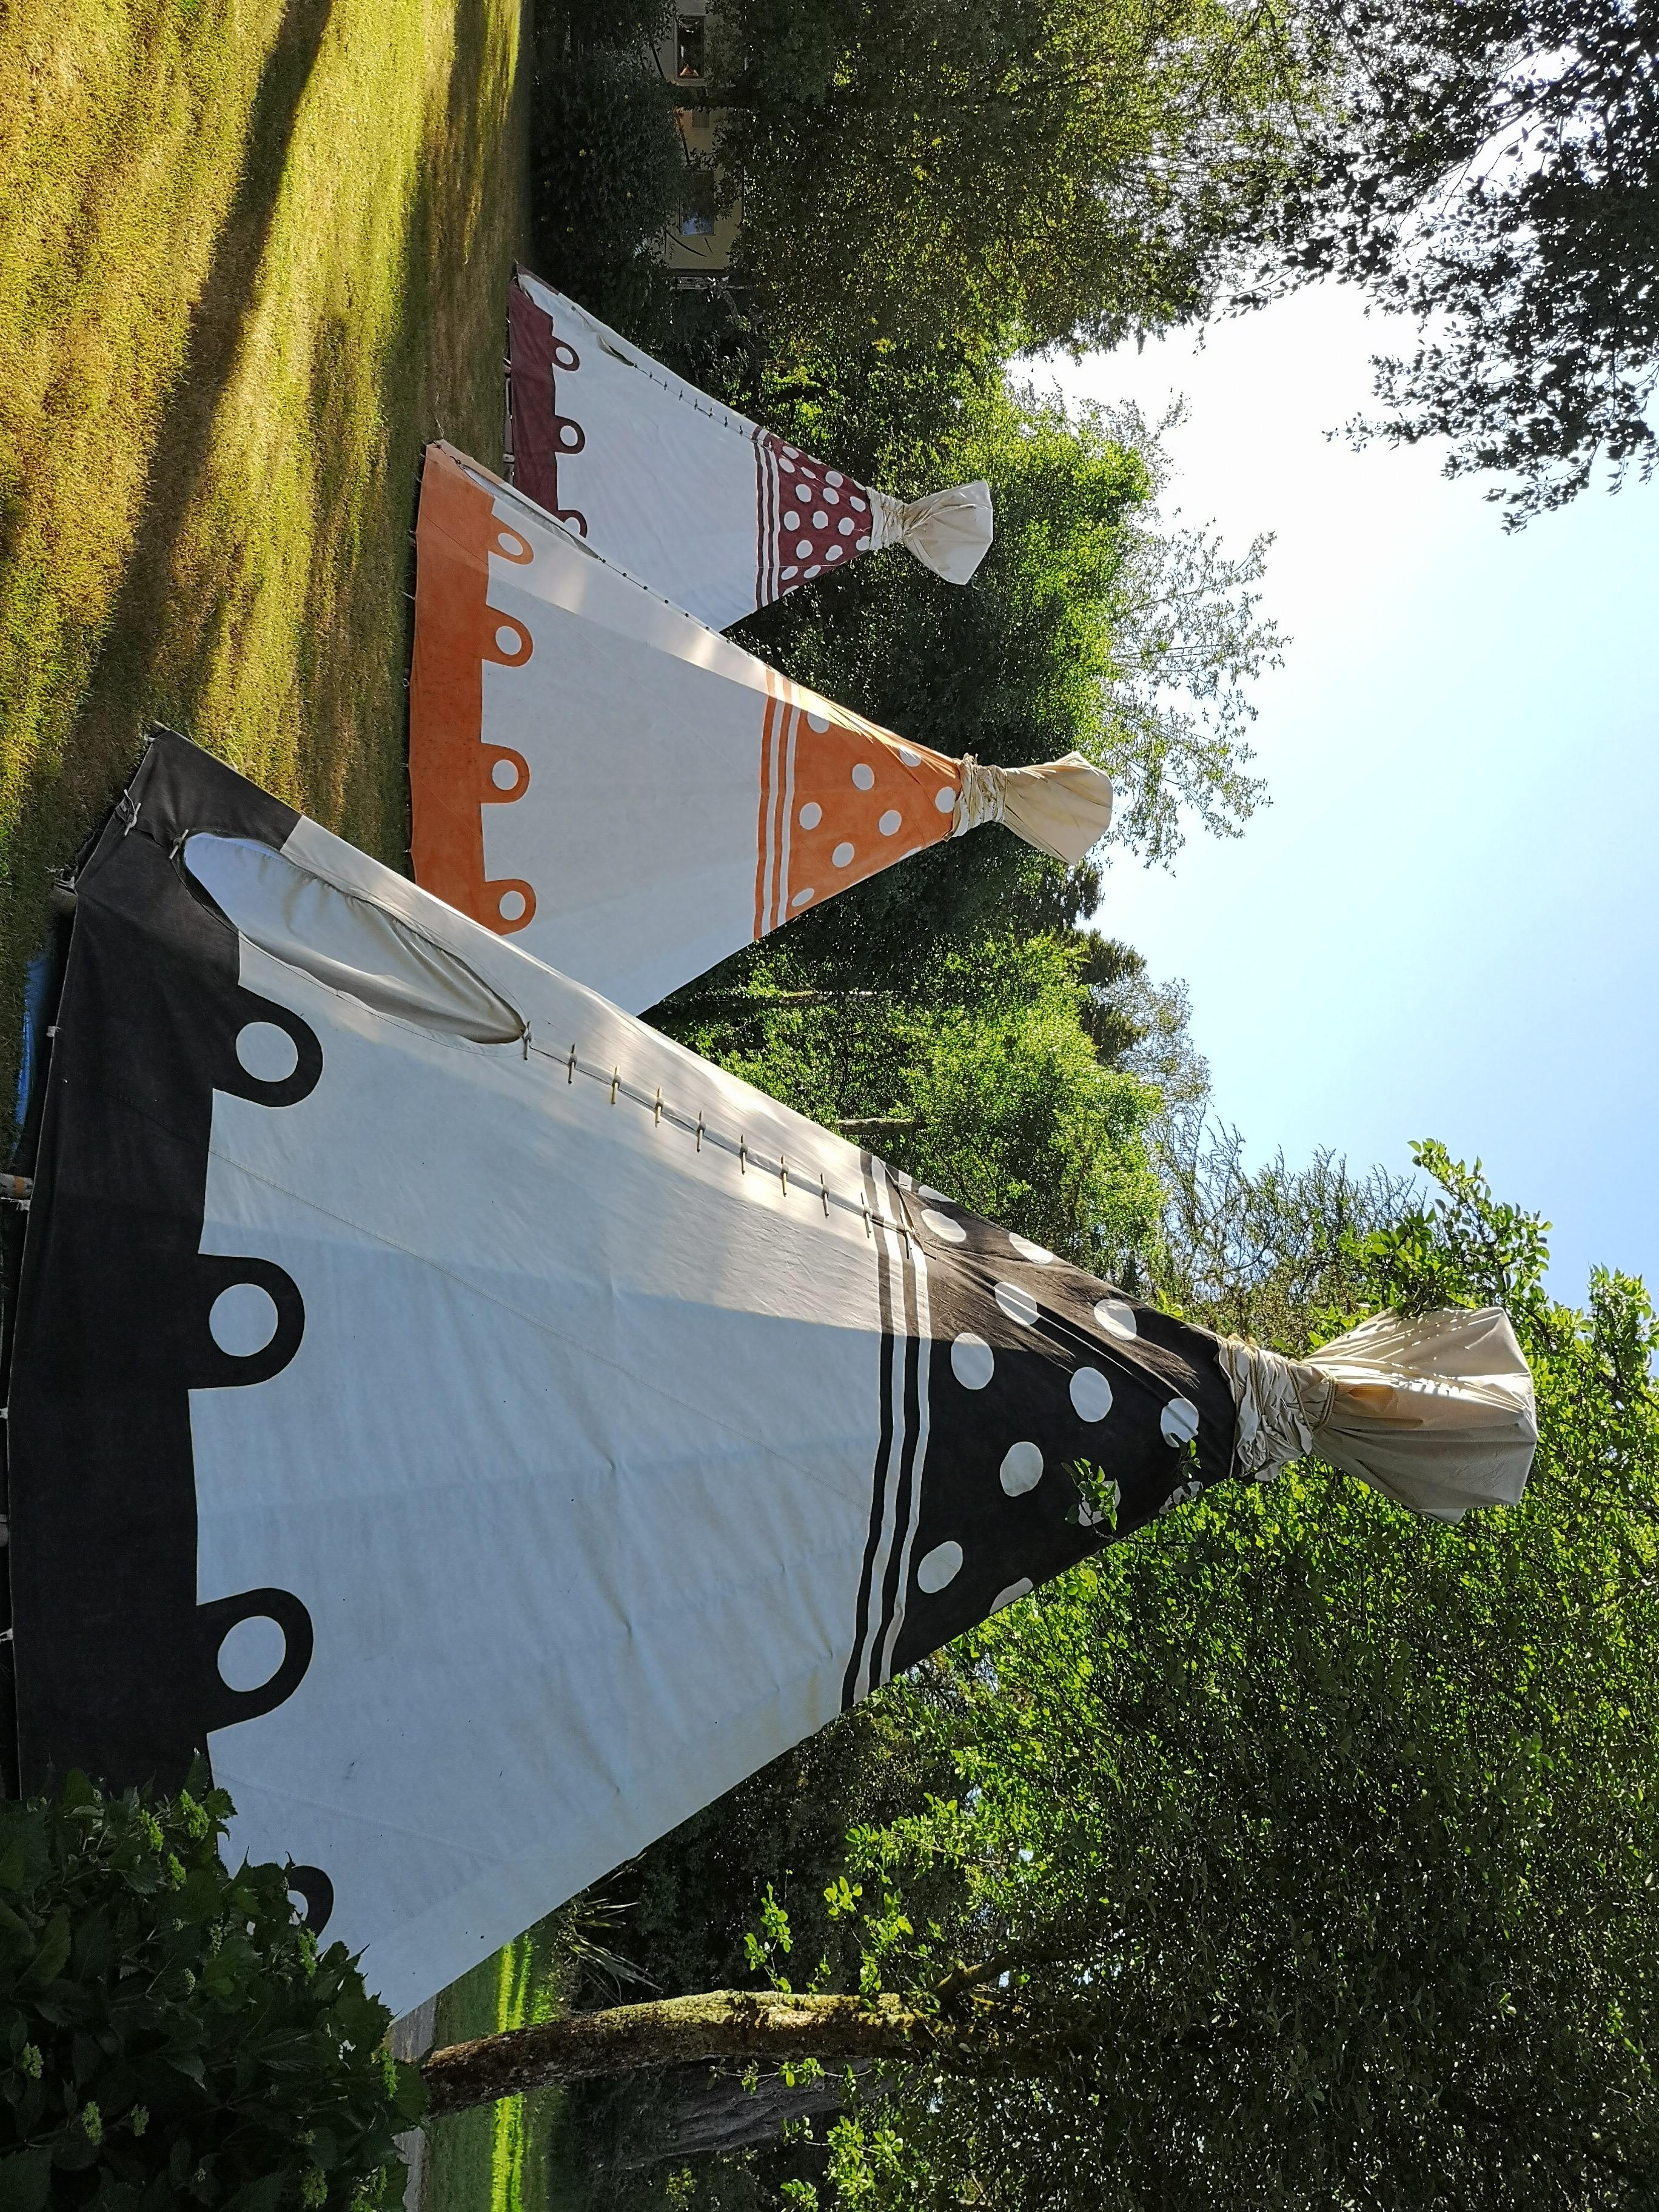 Location - Tipi Tente Insolite 4 Pers - Camping Castel L'Orangerie de Lanniron